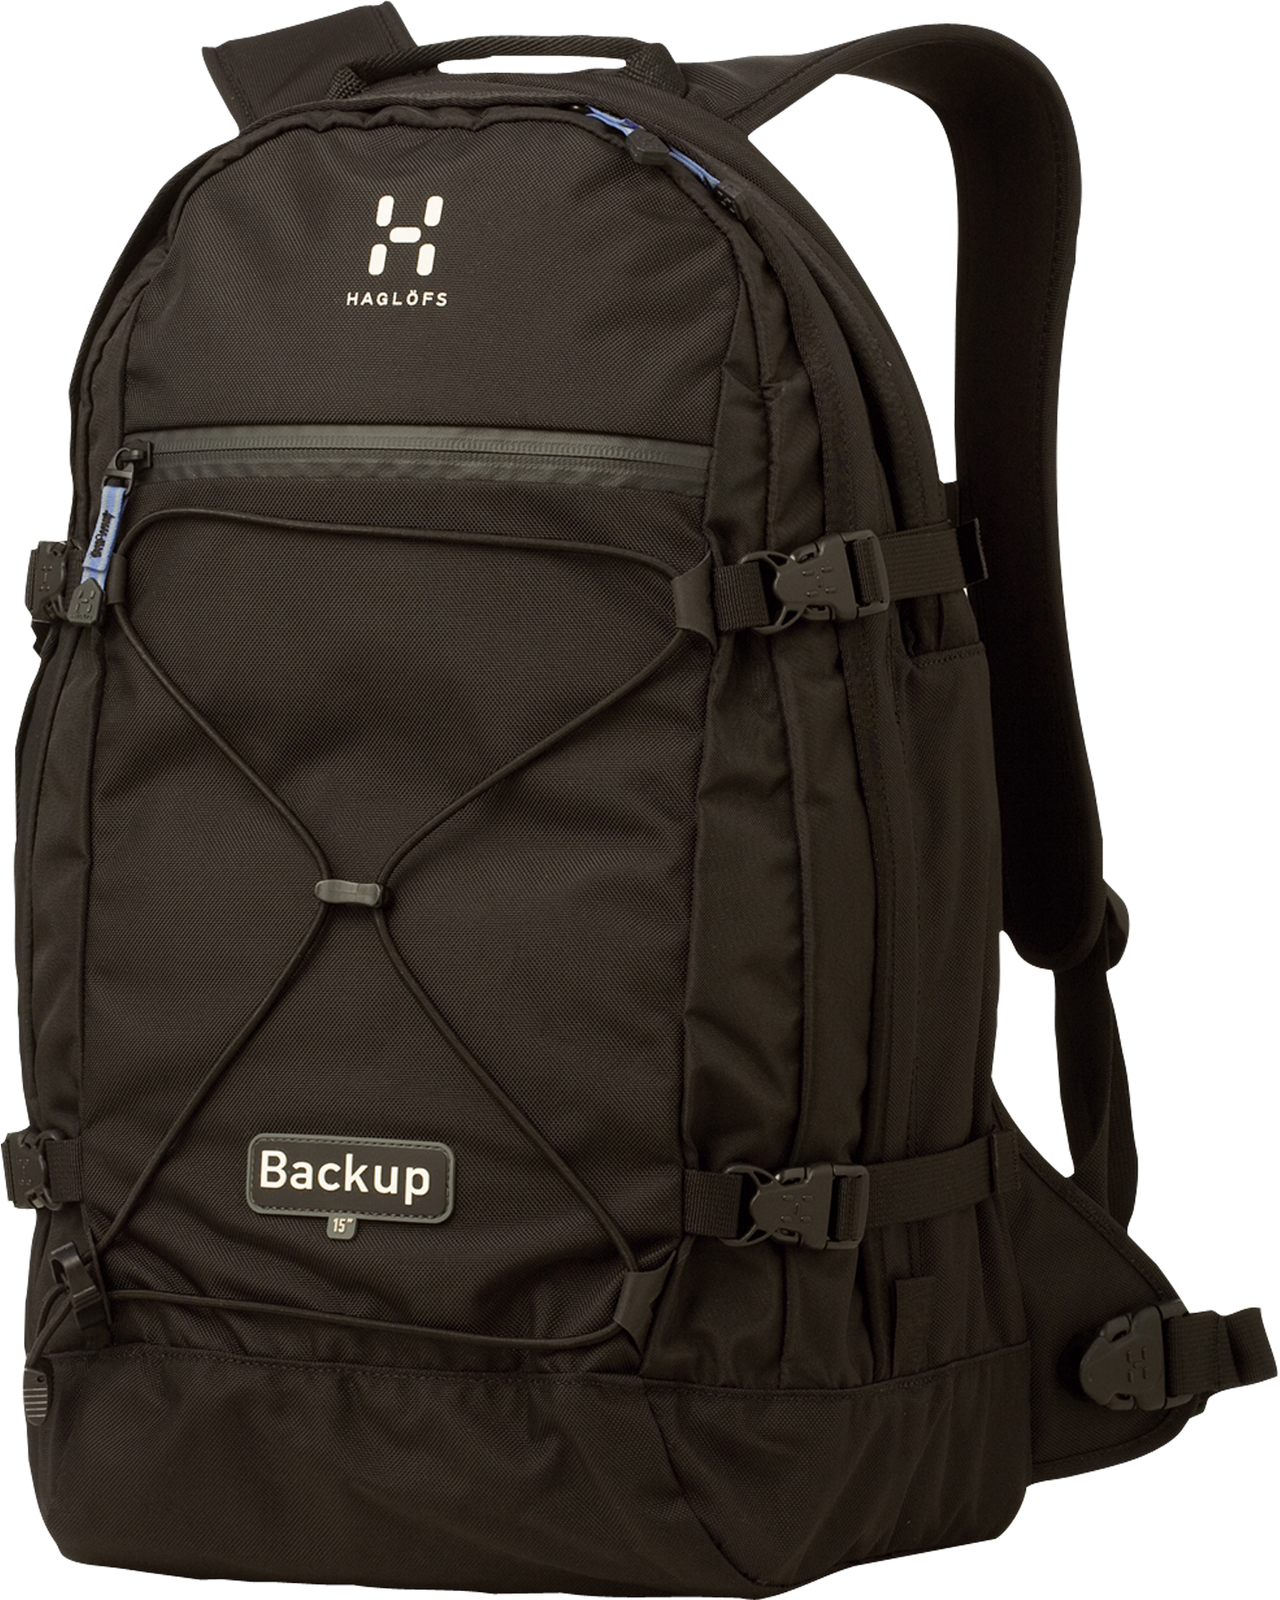 Backpack Outdoor